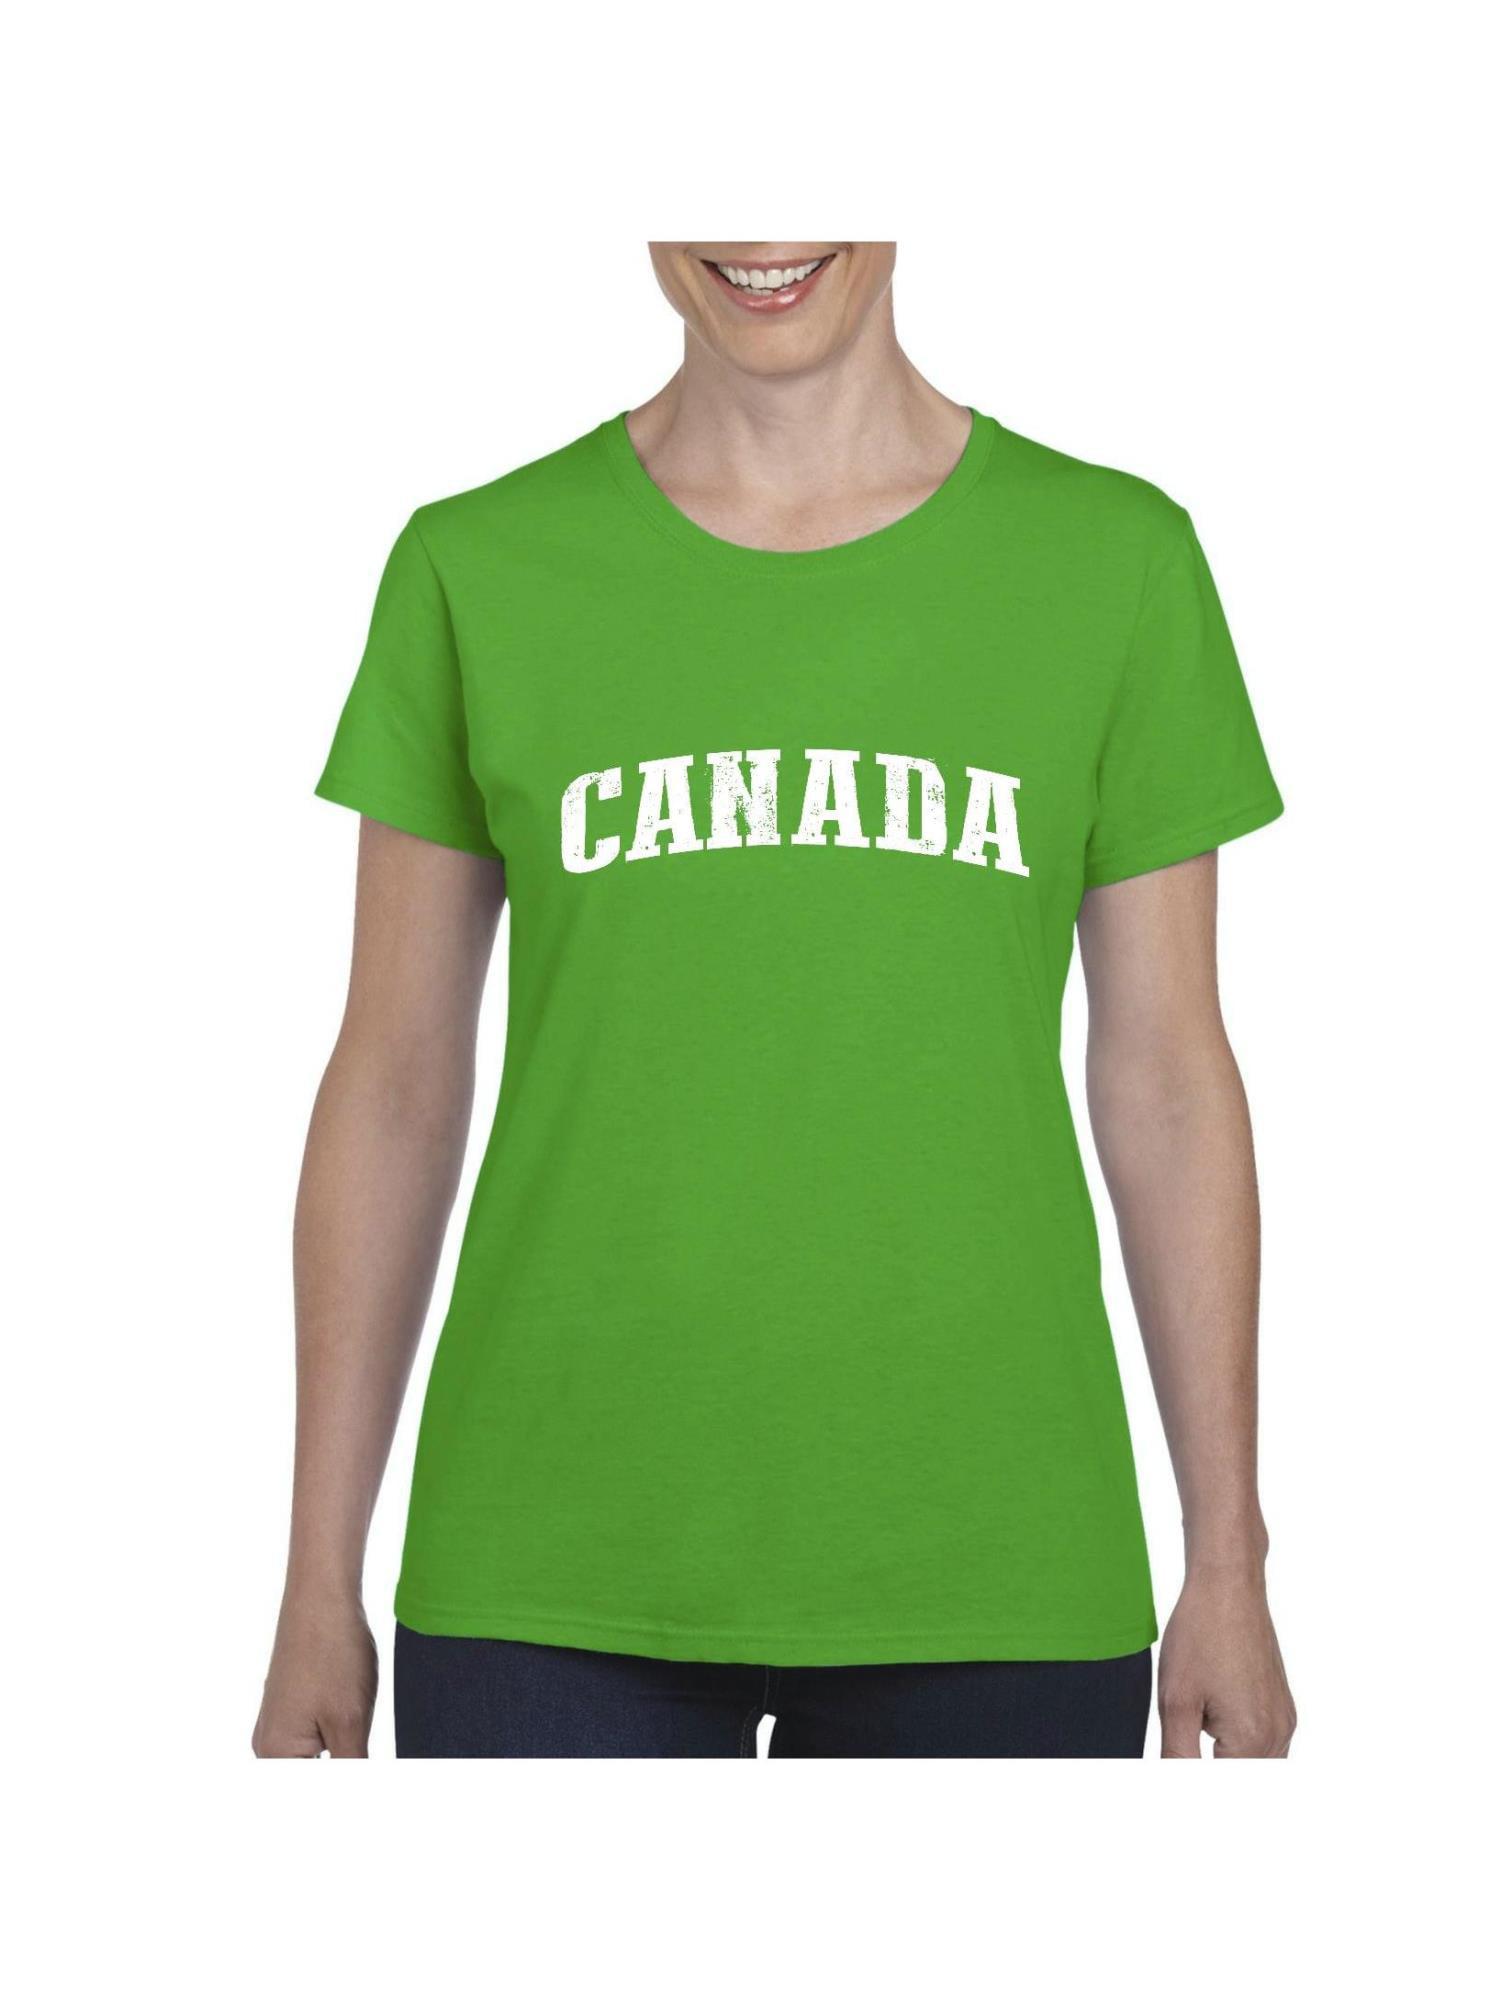 a17971e7 IWPF - Canada Flag Canadian Gift Women's Short Sleeve T-Shirt ...